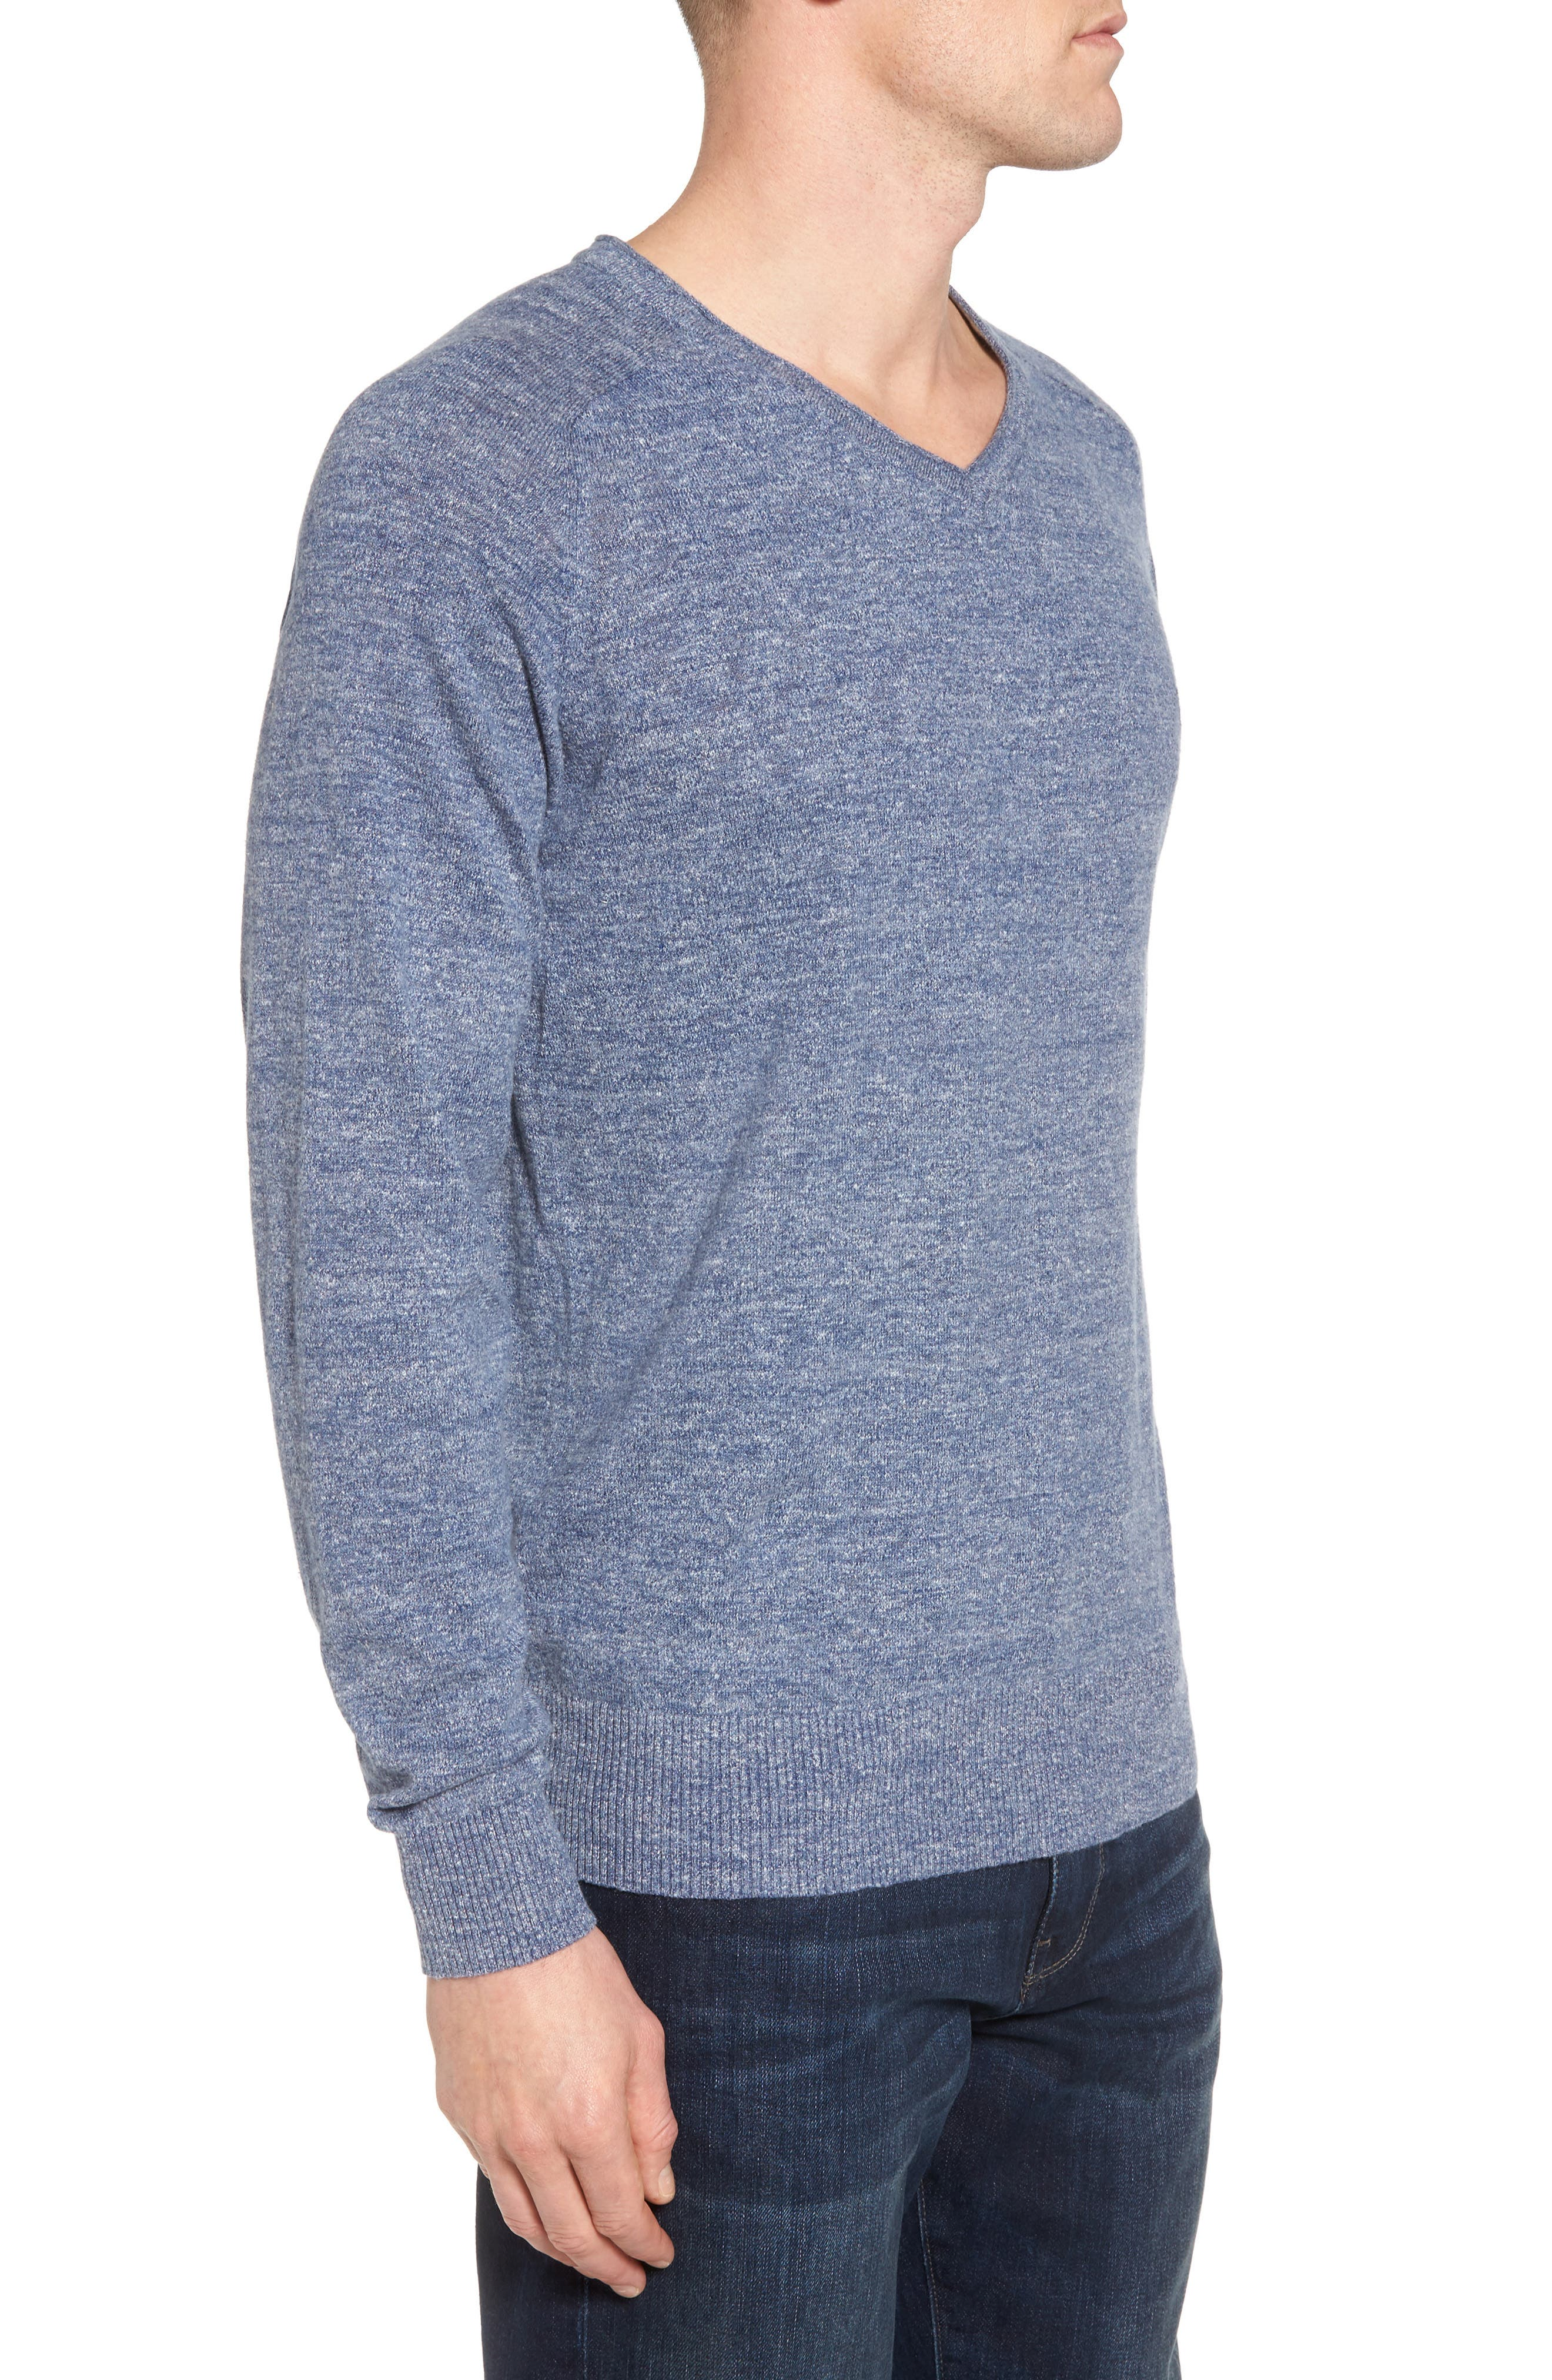 Arbors Cotton V-Neck Sweater,                             Alternate thumbnail 8, color,